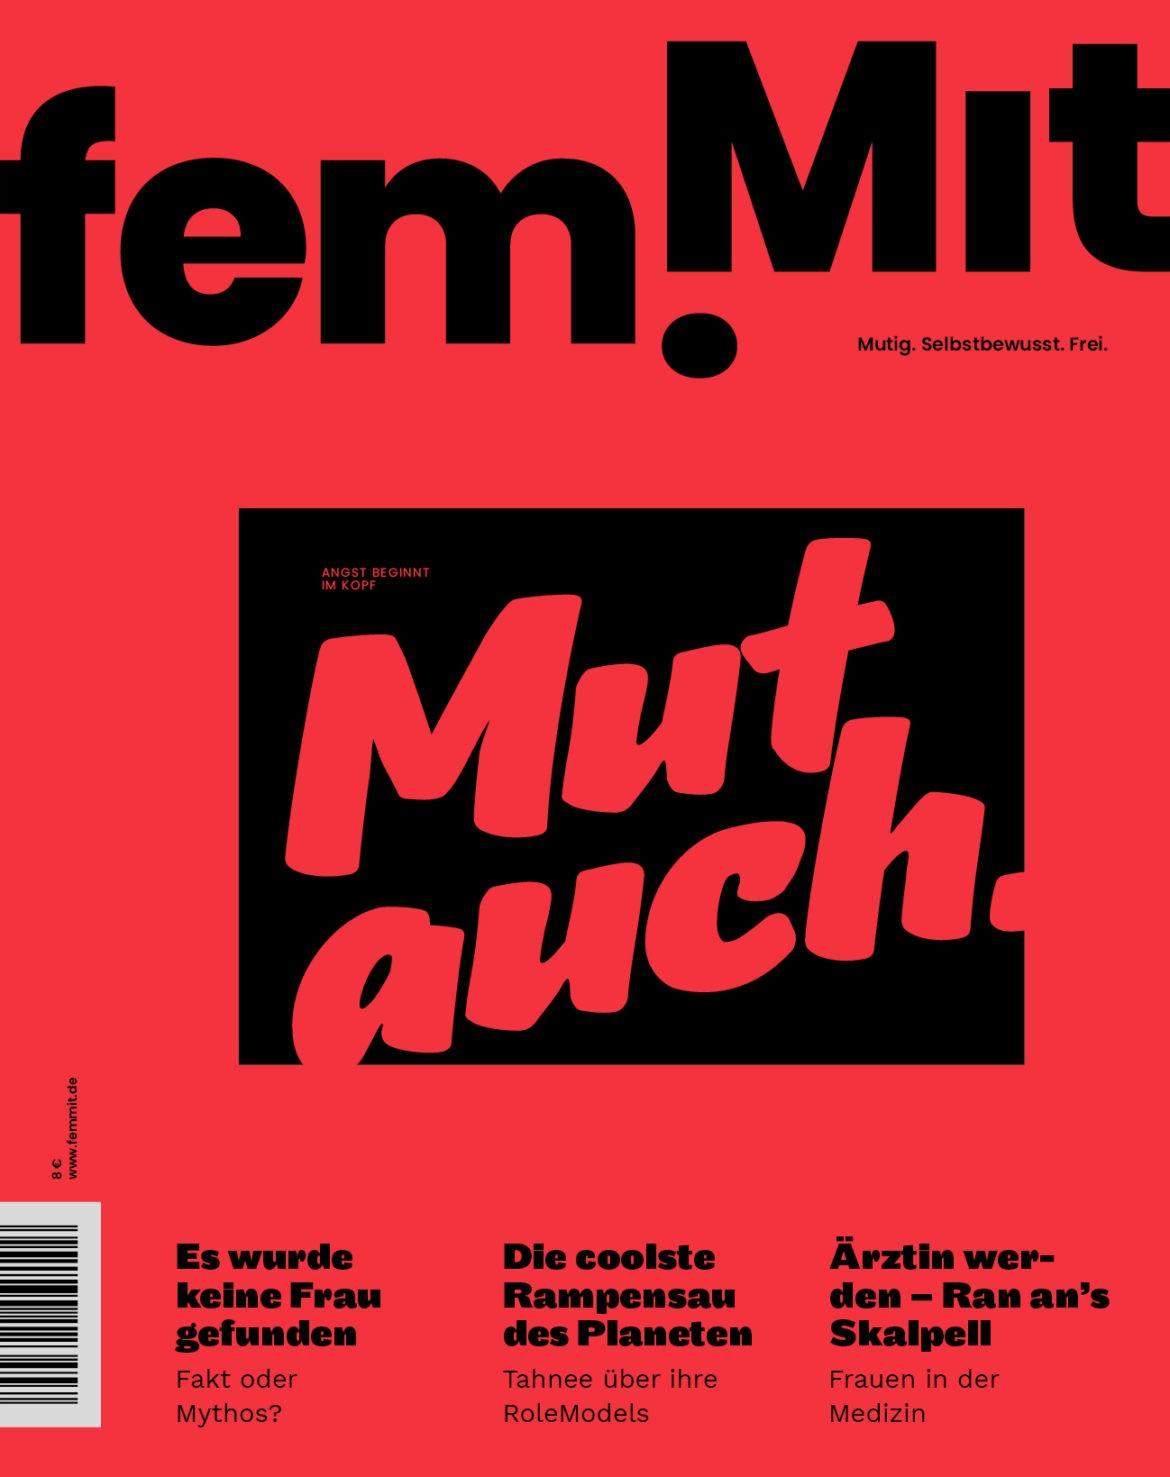 Coverdesign | Editorial | Female |Köln